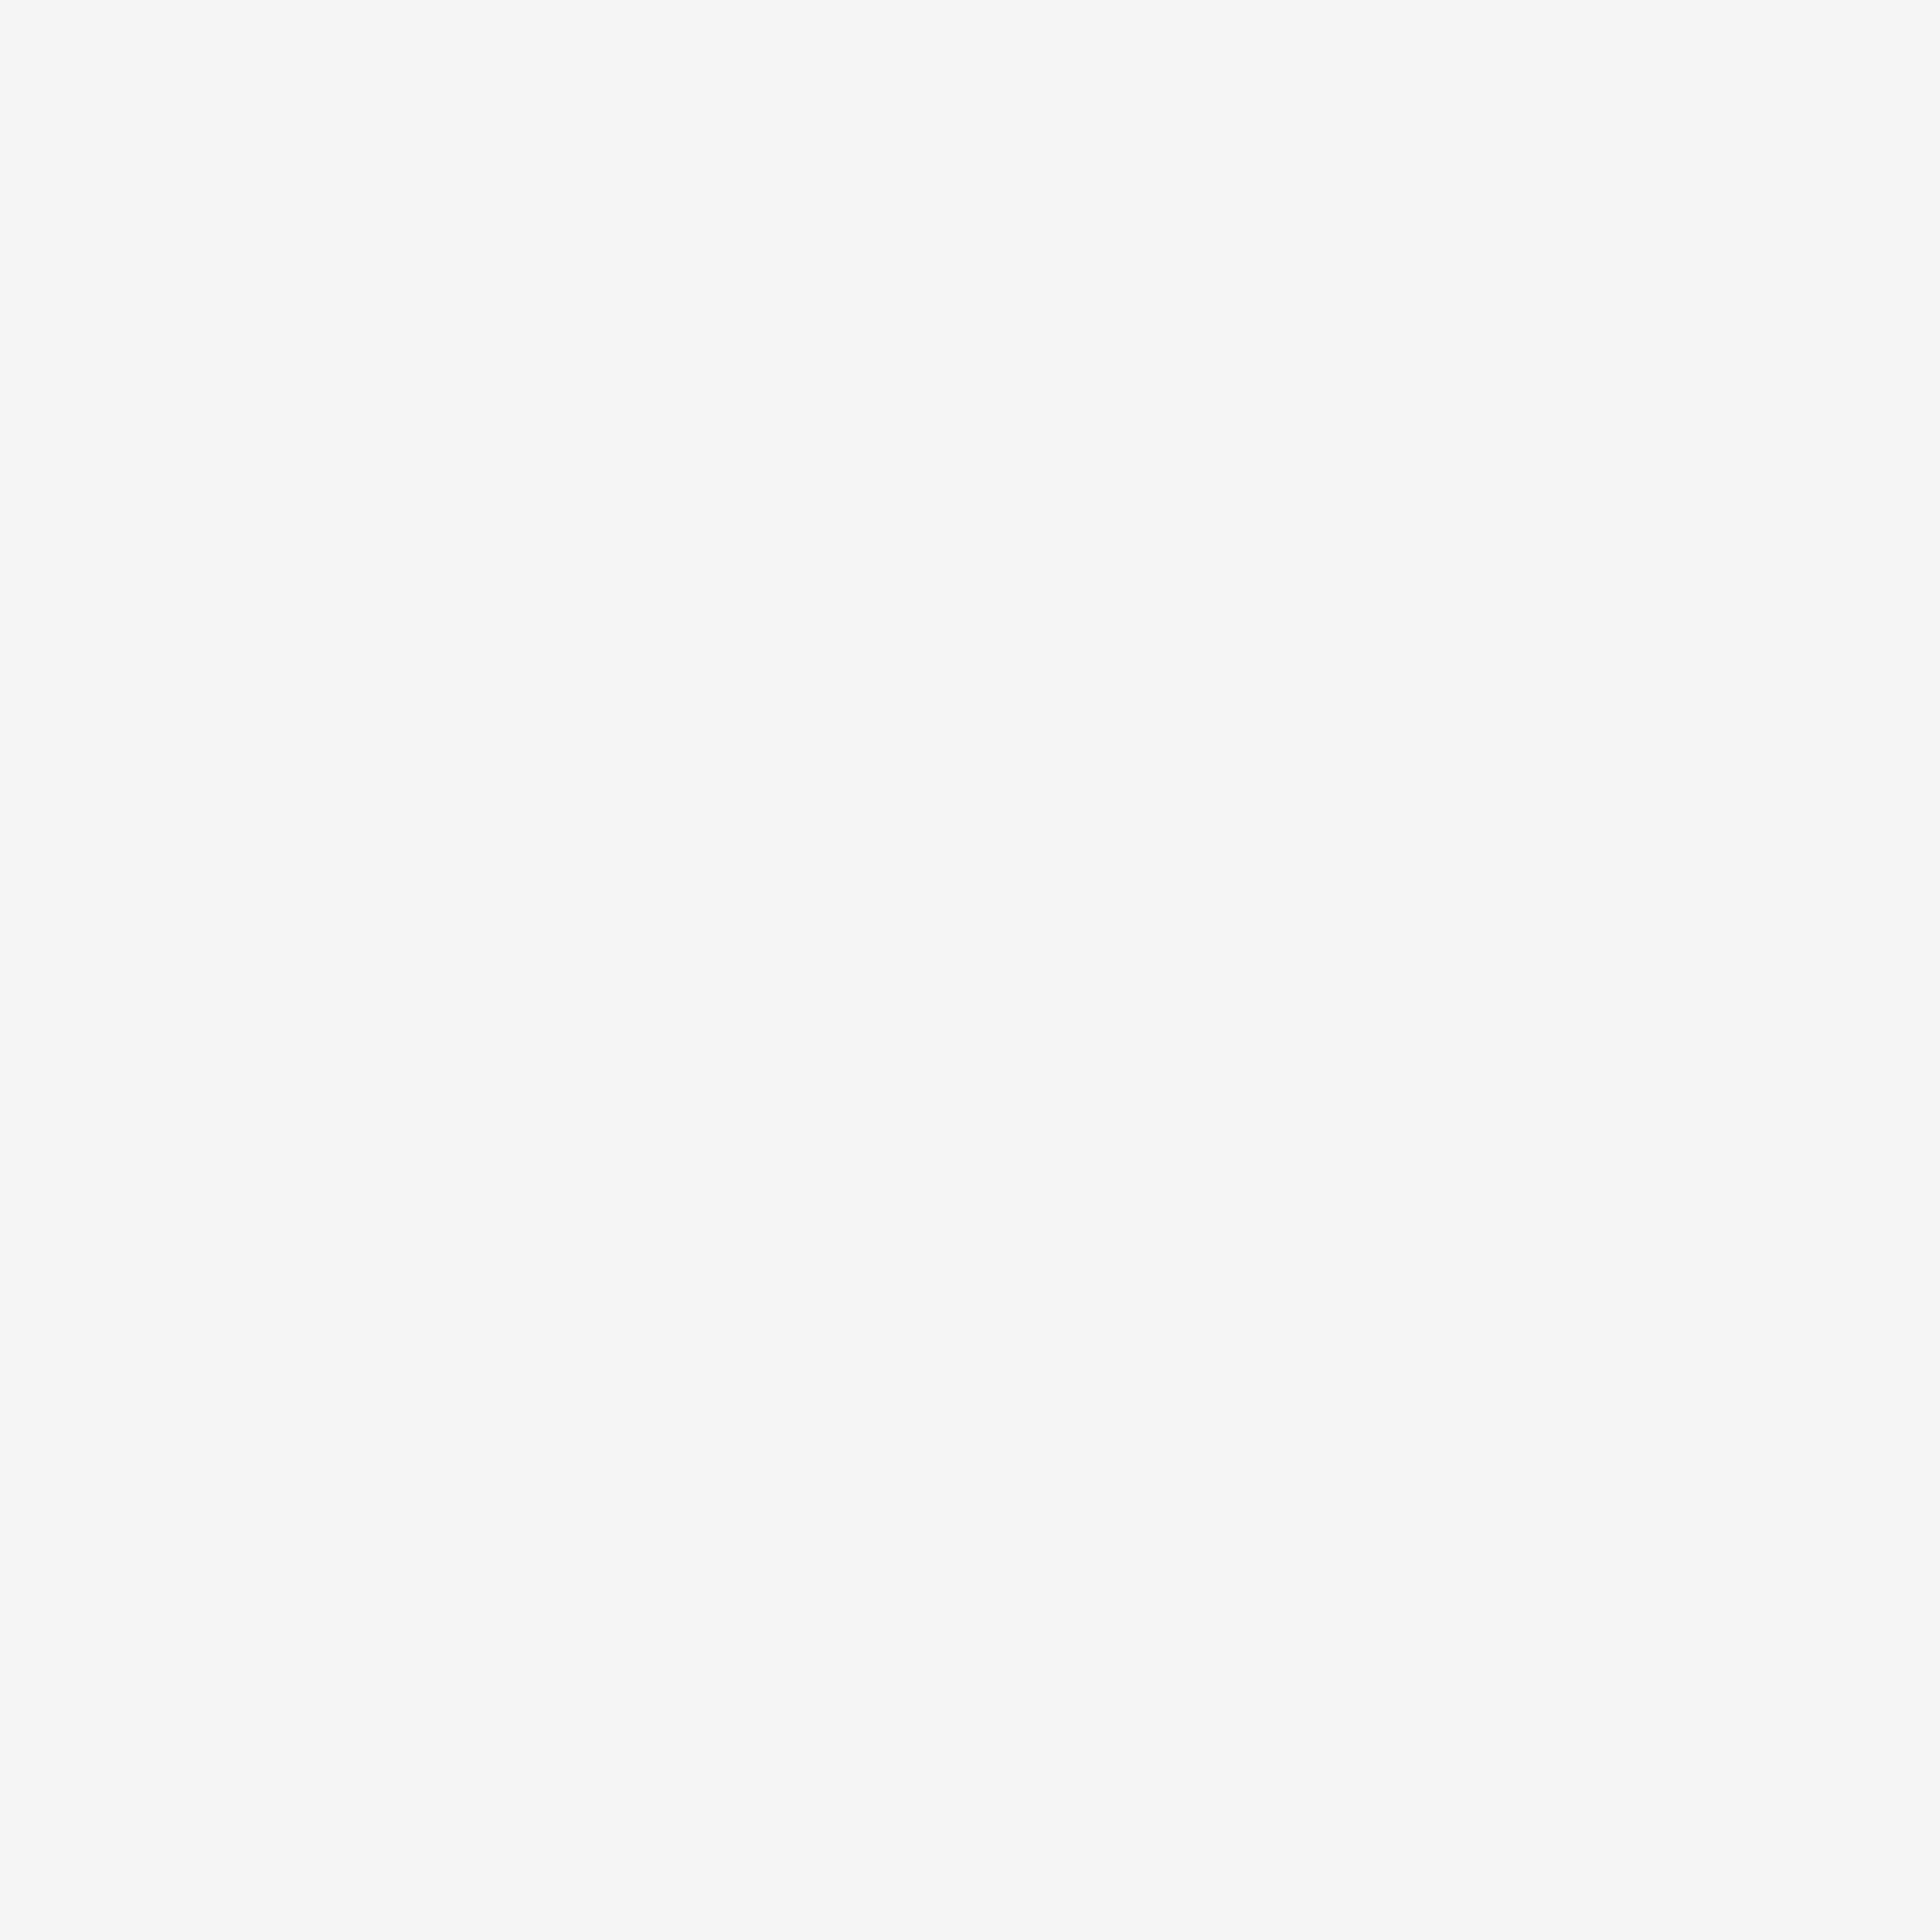 7ea72c5fc13bd6 Puma Olympique Marseille Trainingspak 2018/2019 - Trainingspakken ...